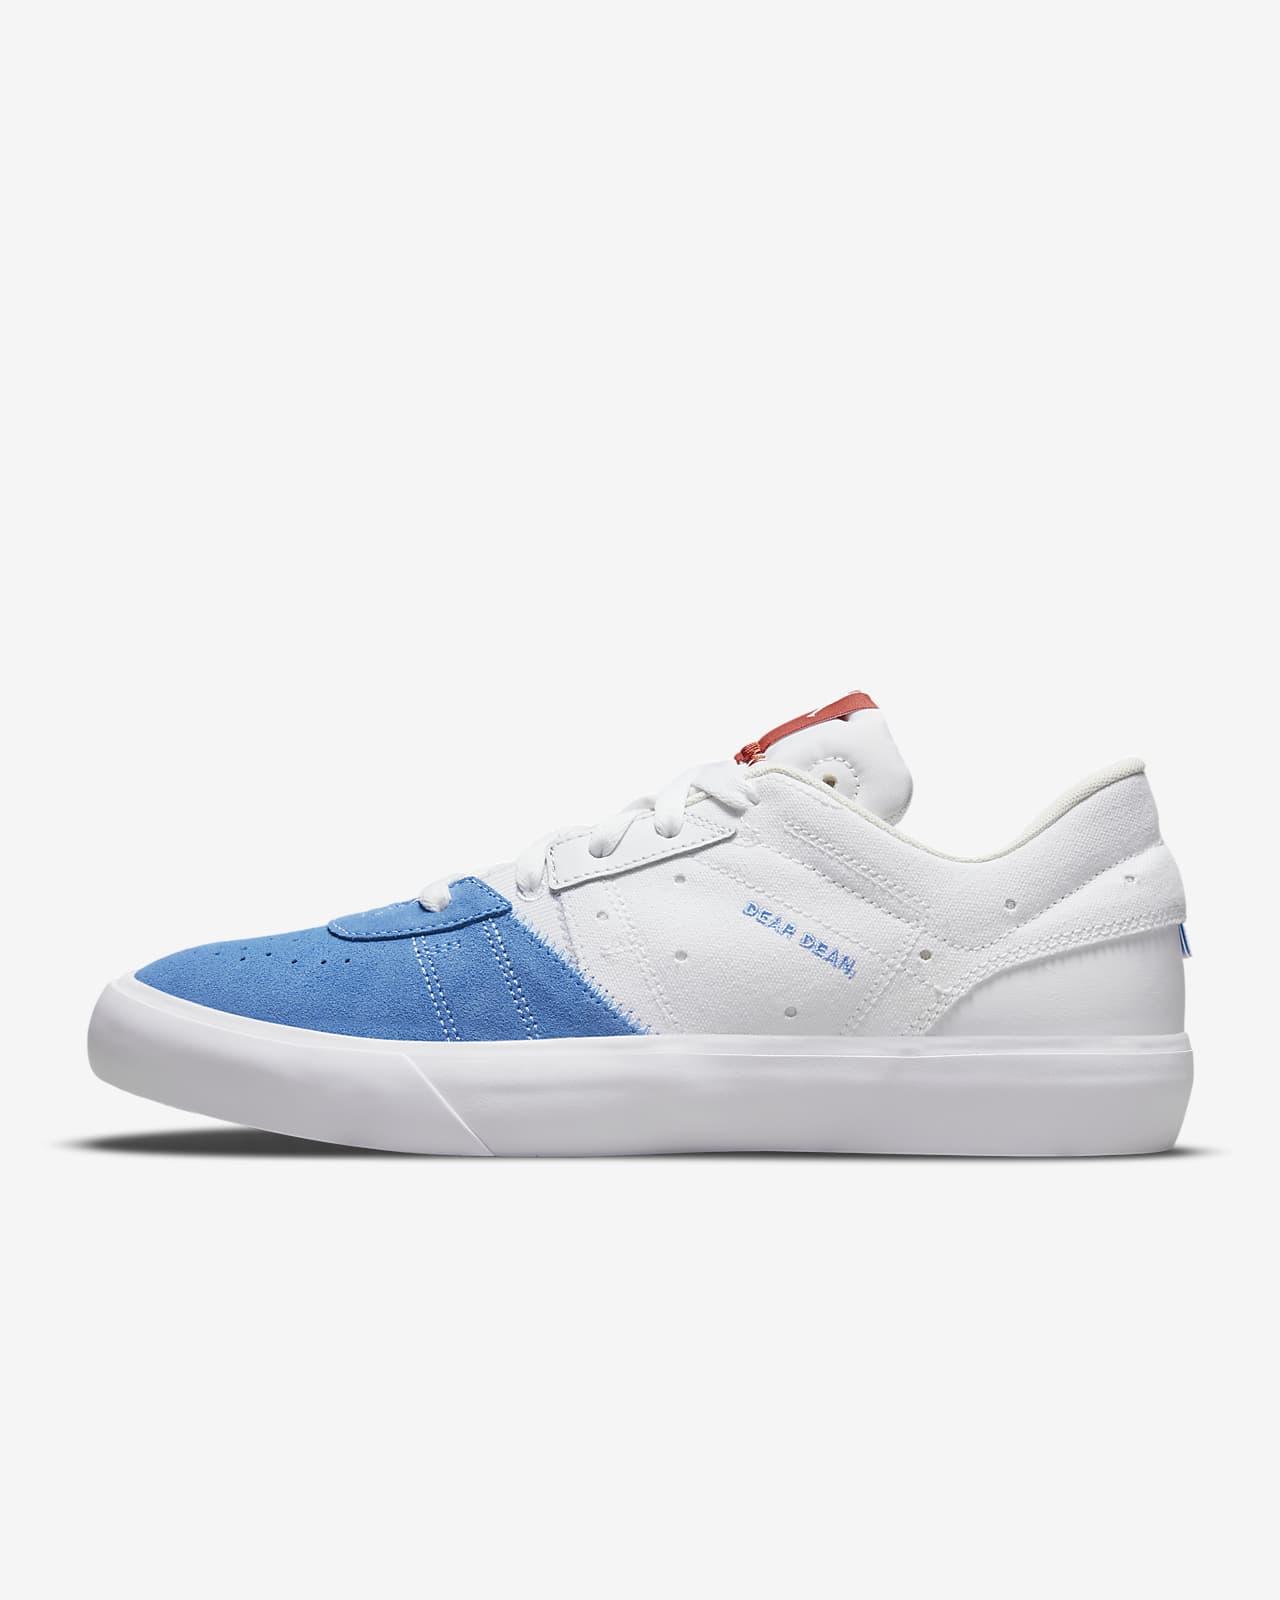 Calzado Jordan Series .02